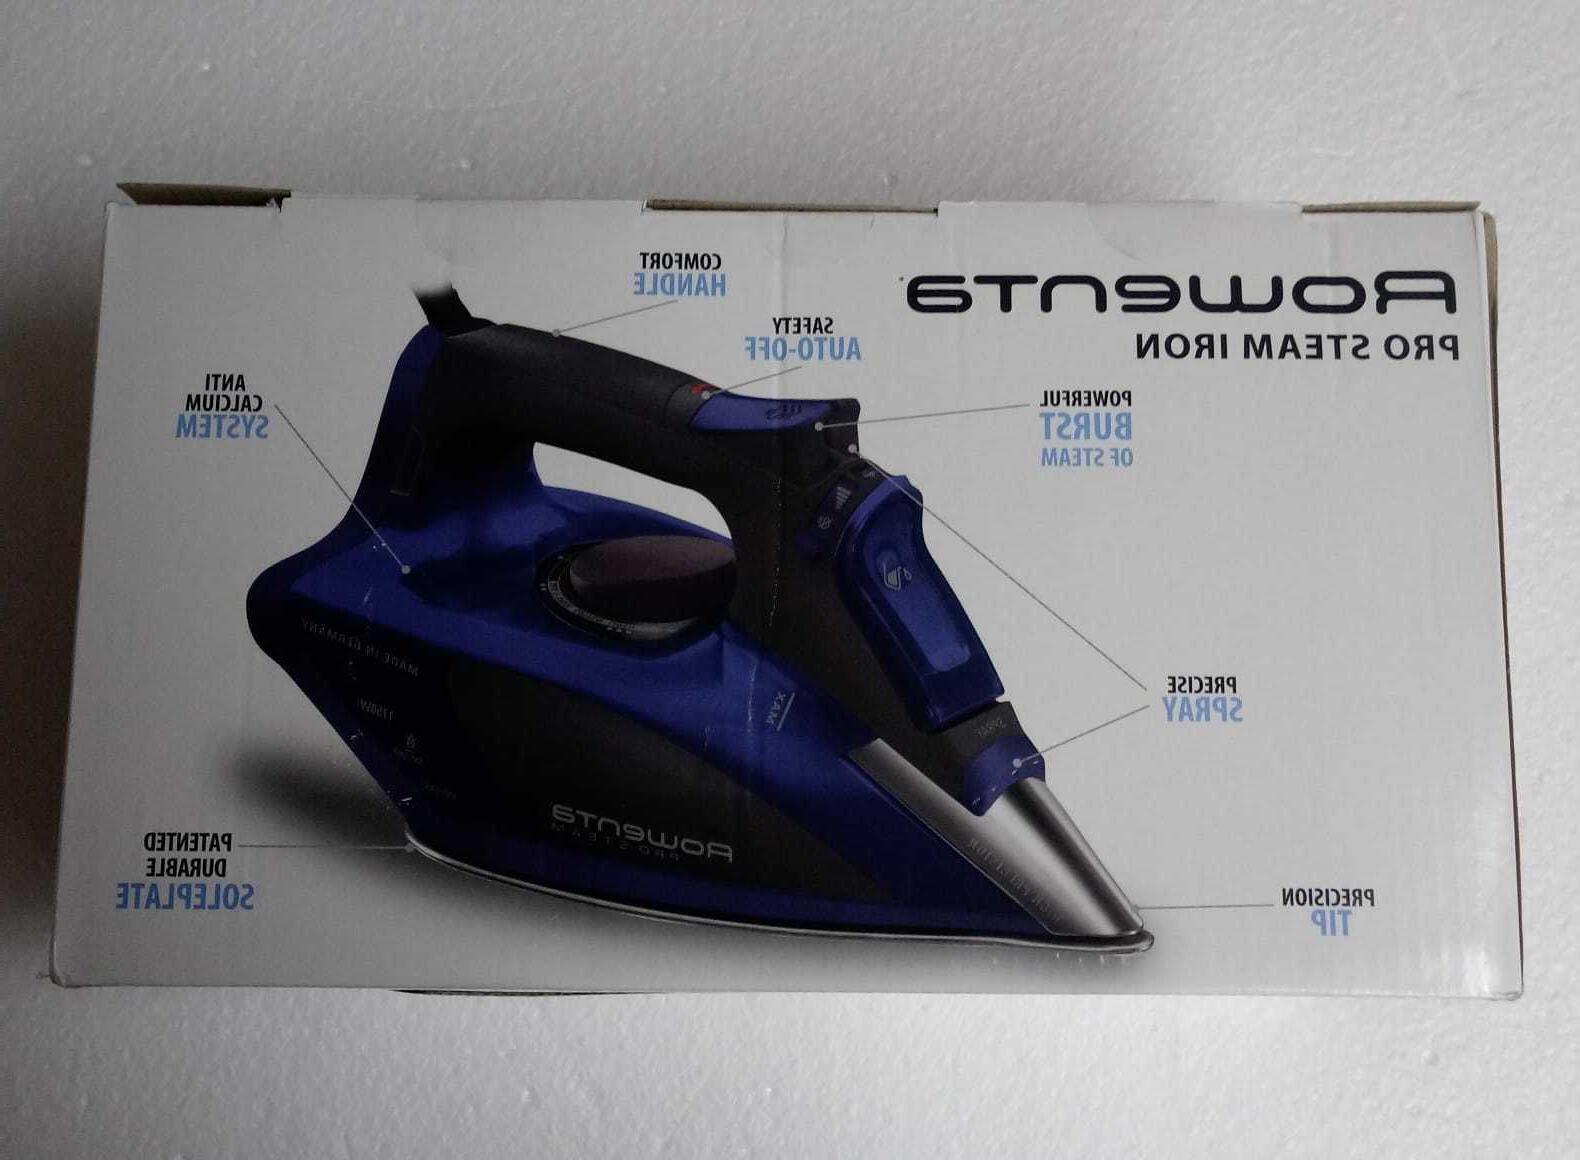 Rowenta DW5192 Pro Iron Stainless with